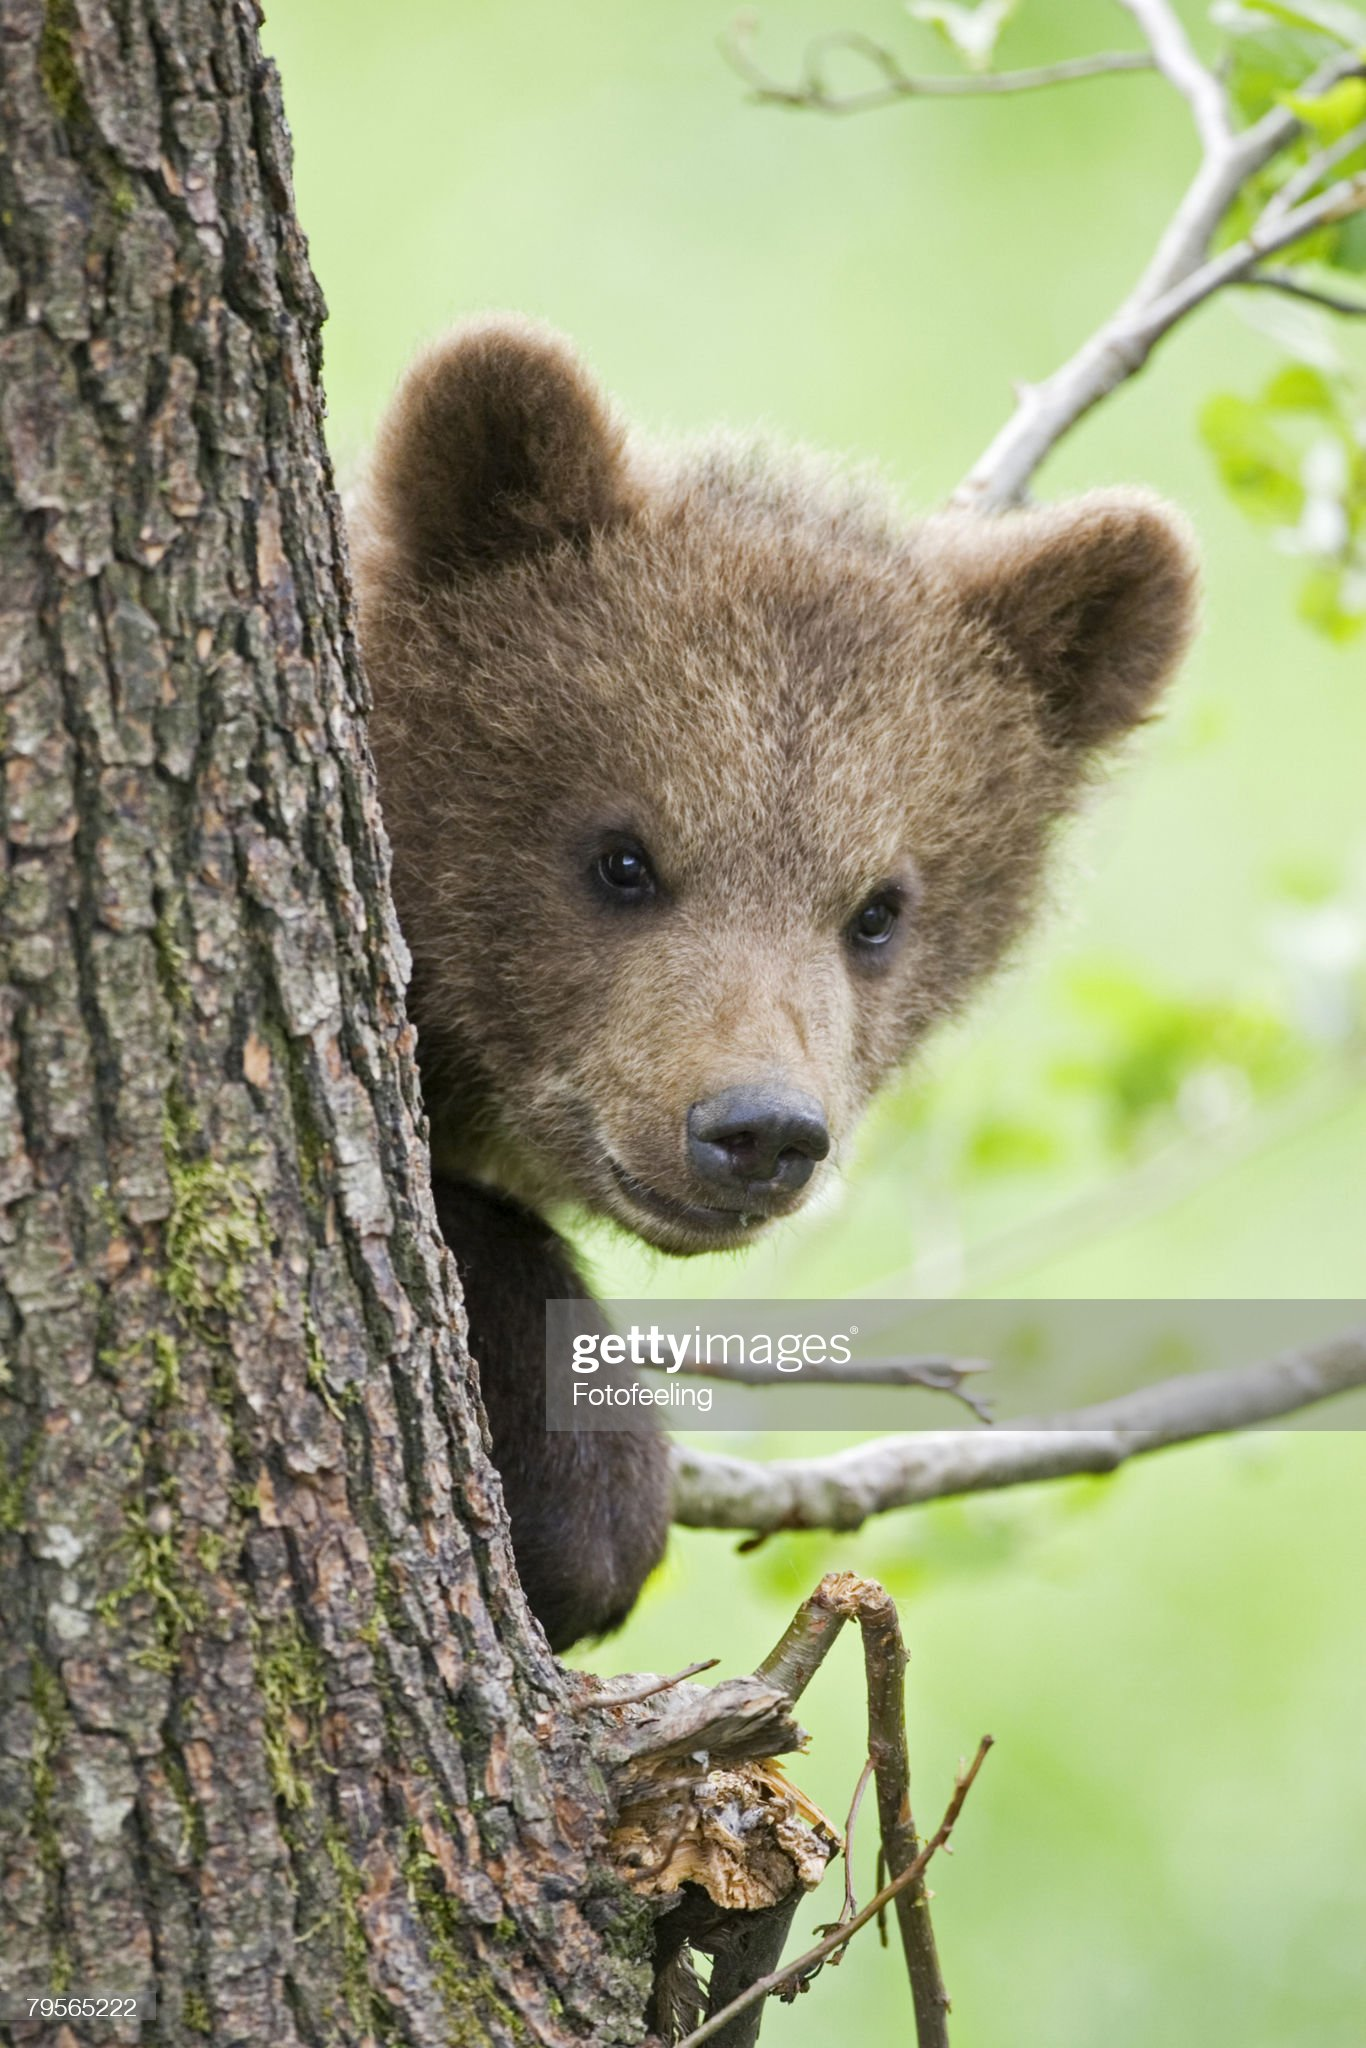 European Brown bear cub in tree (Ursus arctos), close-up : Foto stock